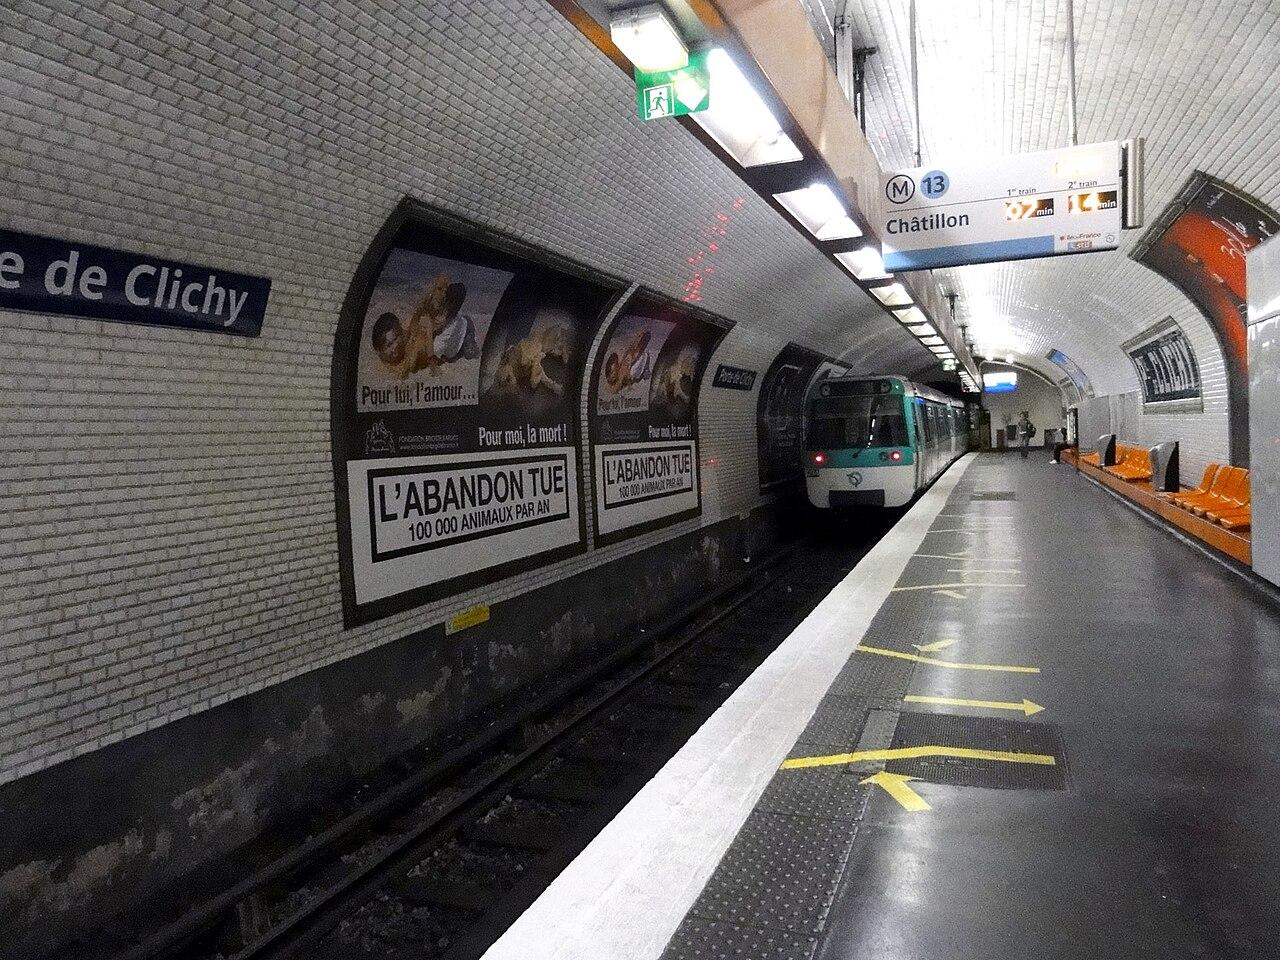 file metro de ligne 13 porte de clichy 01 jpg wikimedia commons